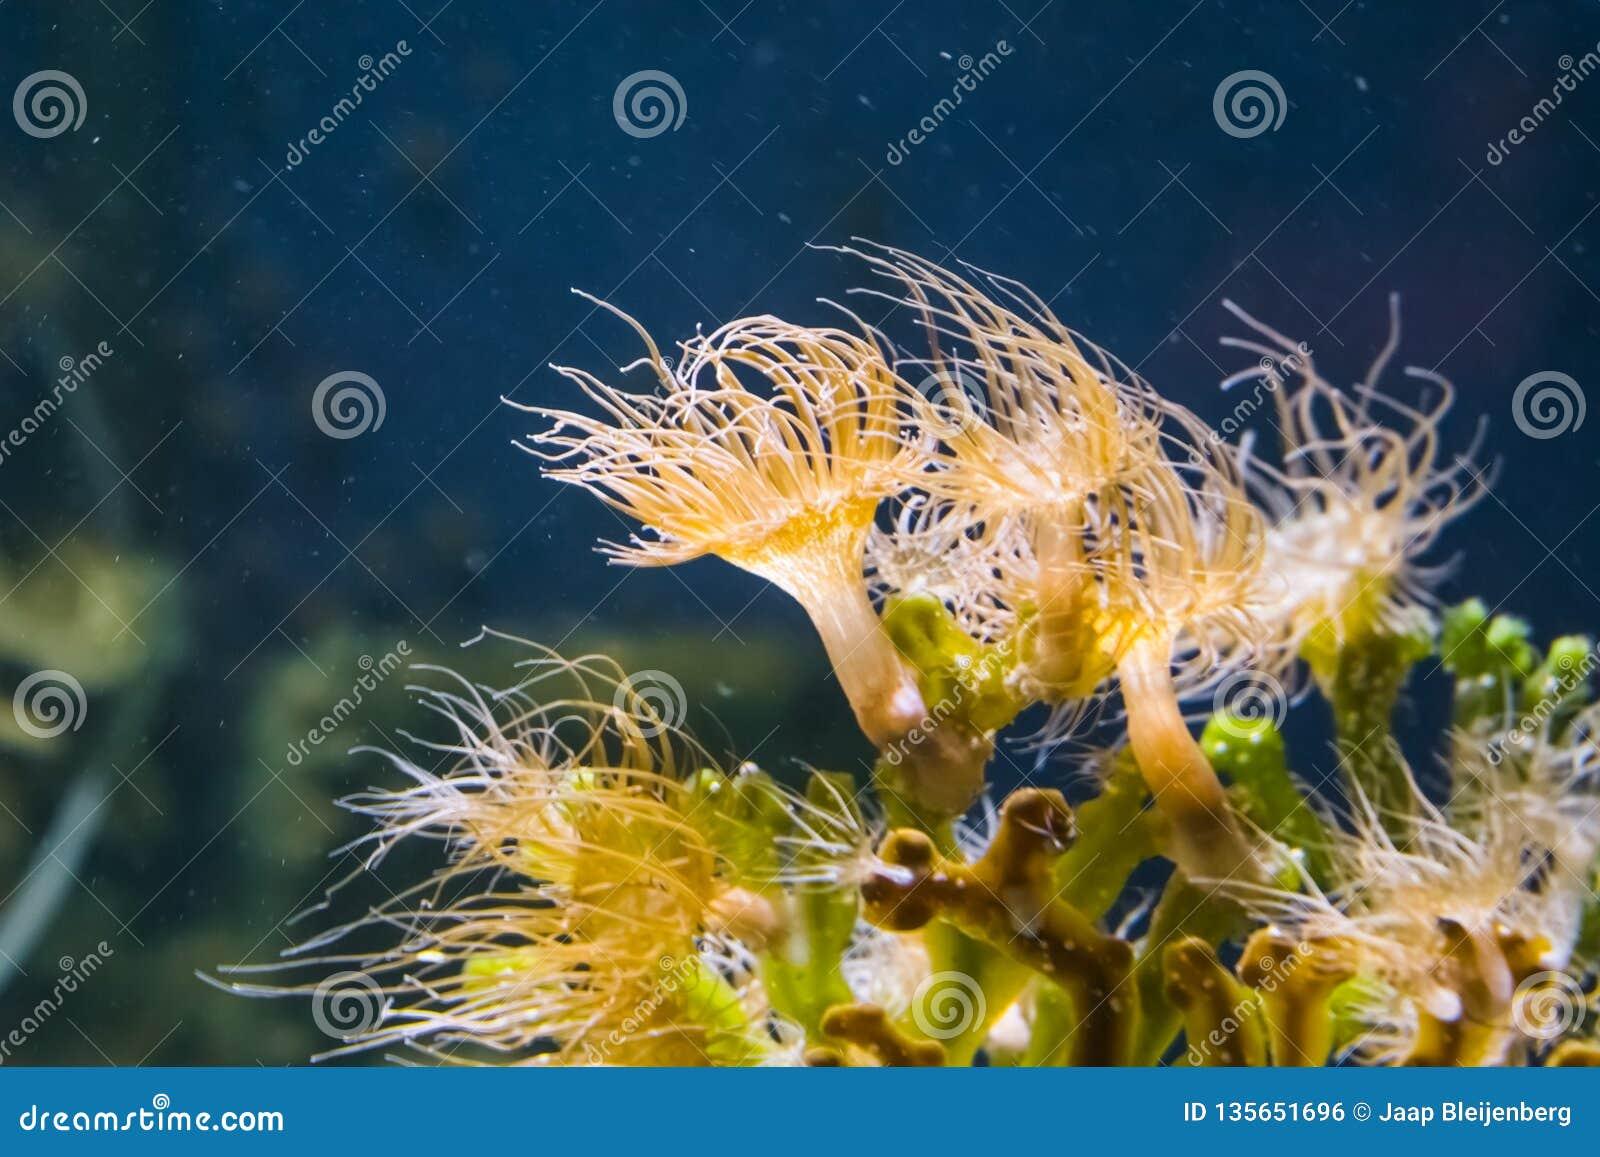 Closeup of a group of plumose sea anemones, tentacled orange anemone, popular pet in aquaculture